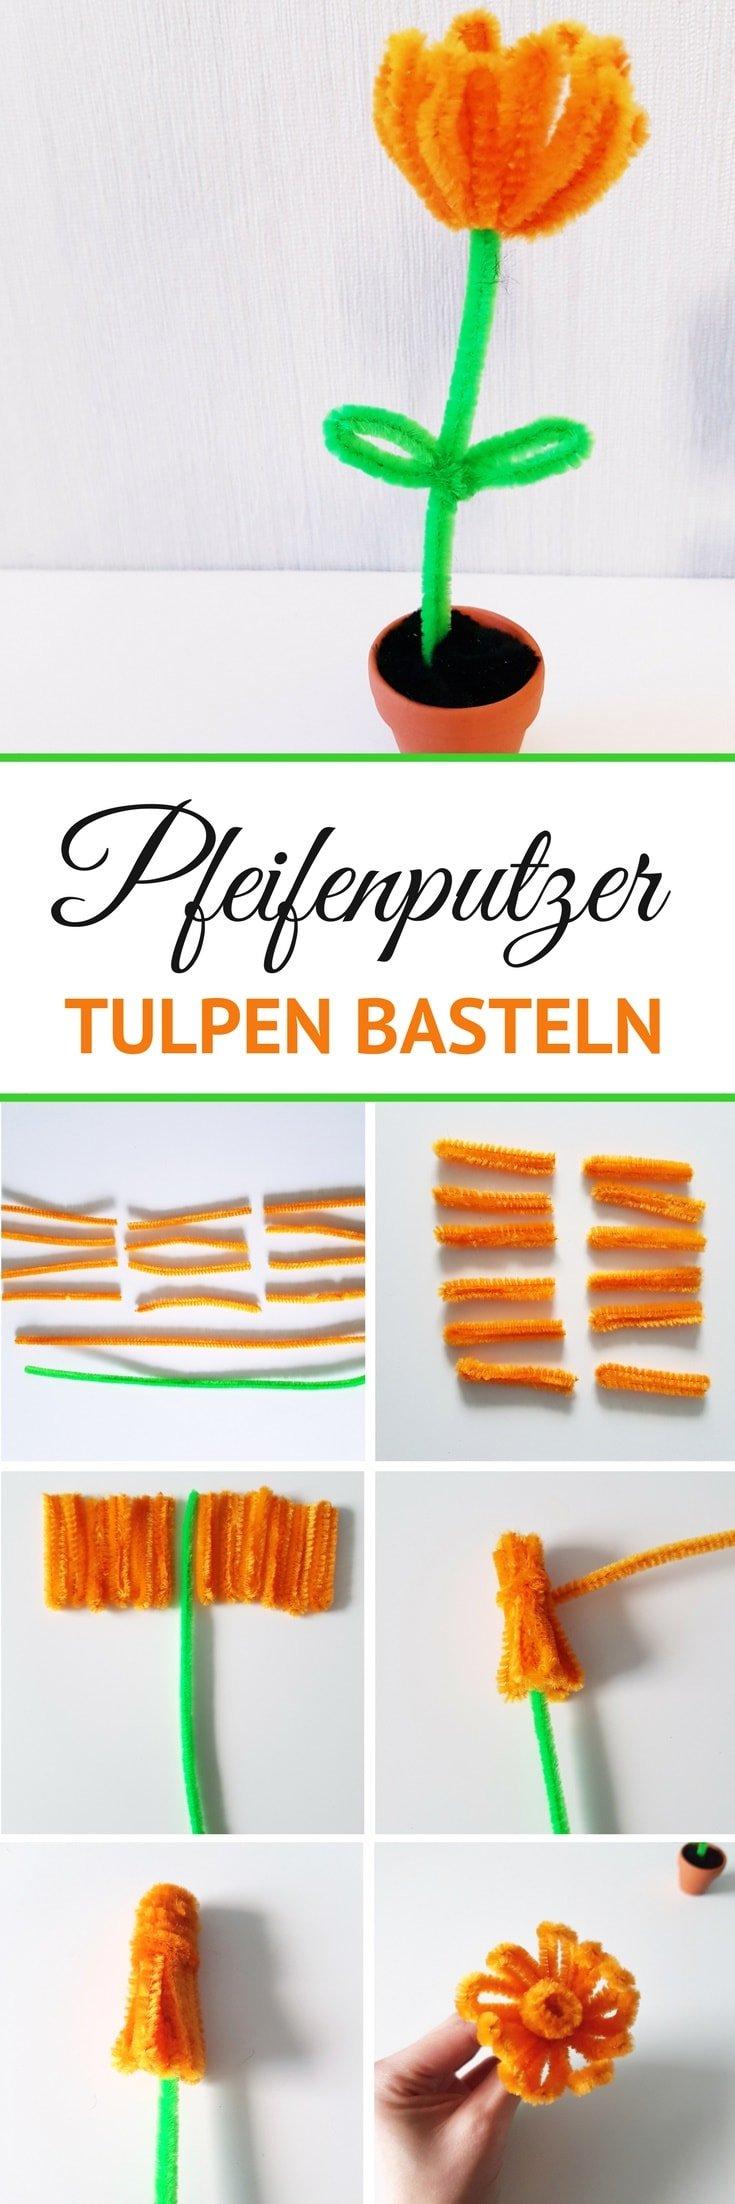 DIY Anleitung Pfeifenputzer Tulpen Blumen basteln